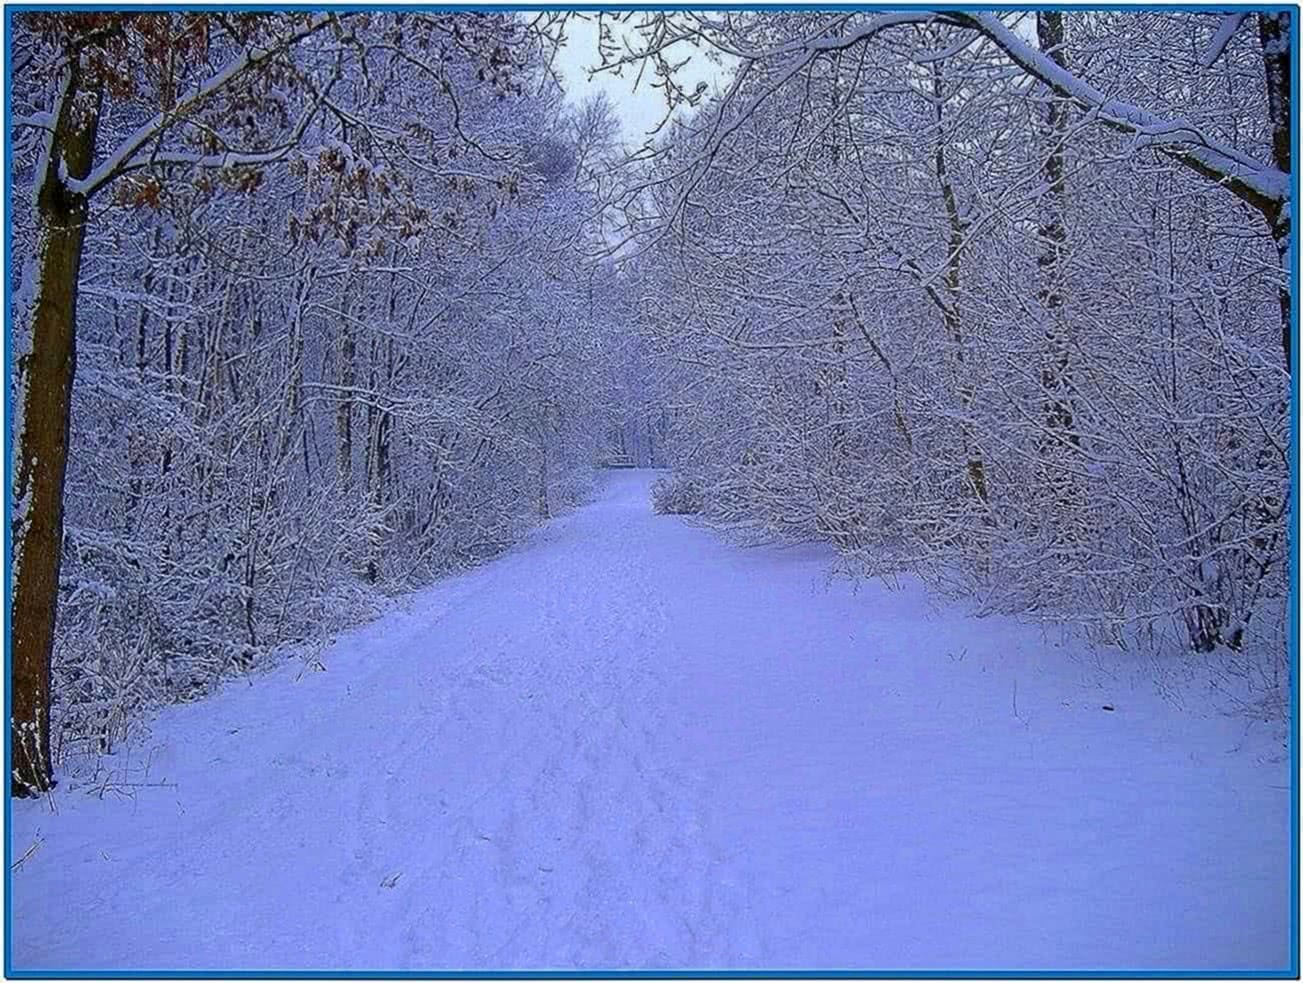 Animated winter scenes screensaver - Download free